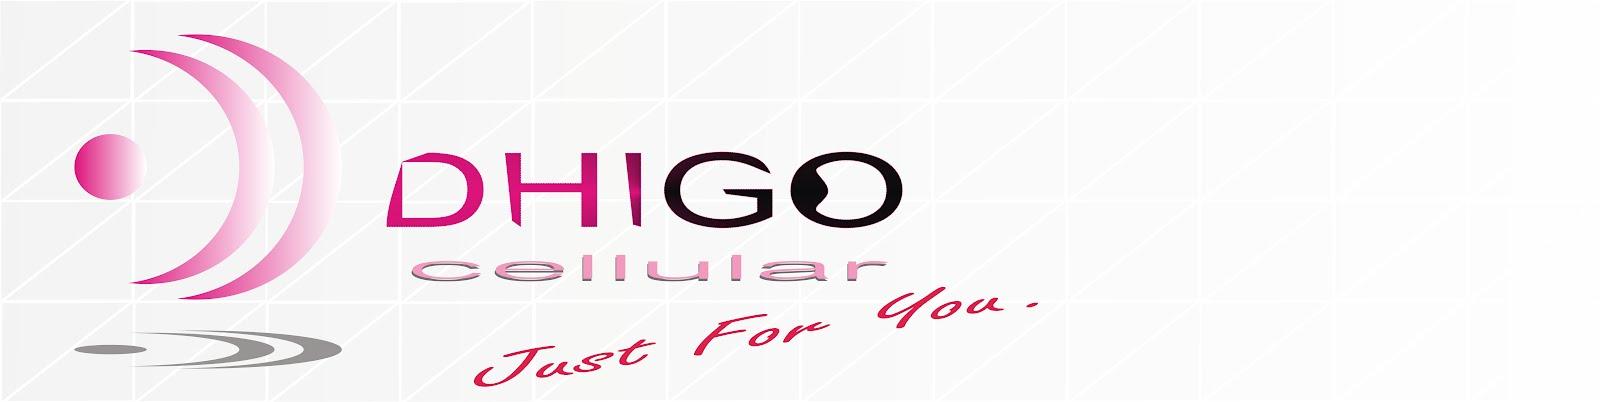 Dhigo Cellular